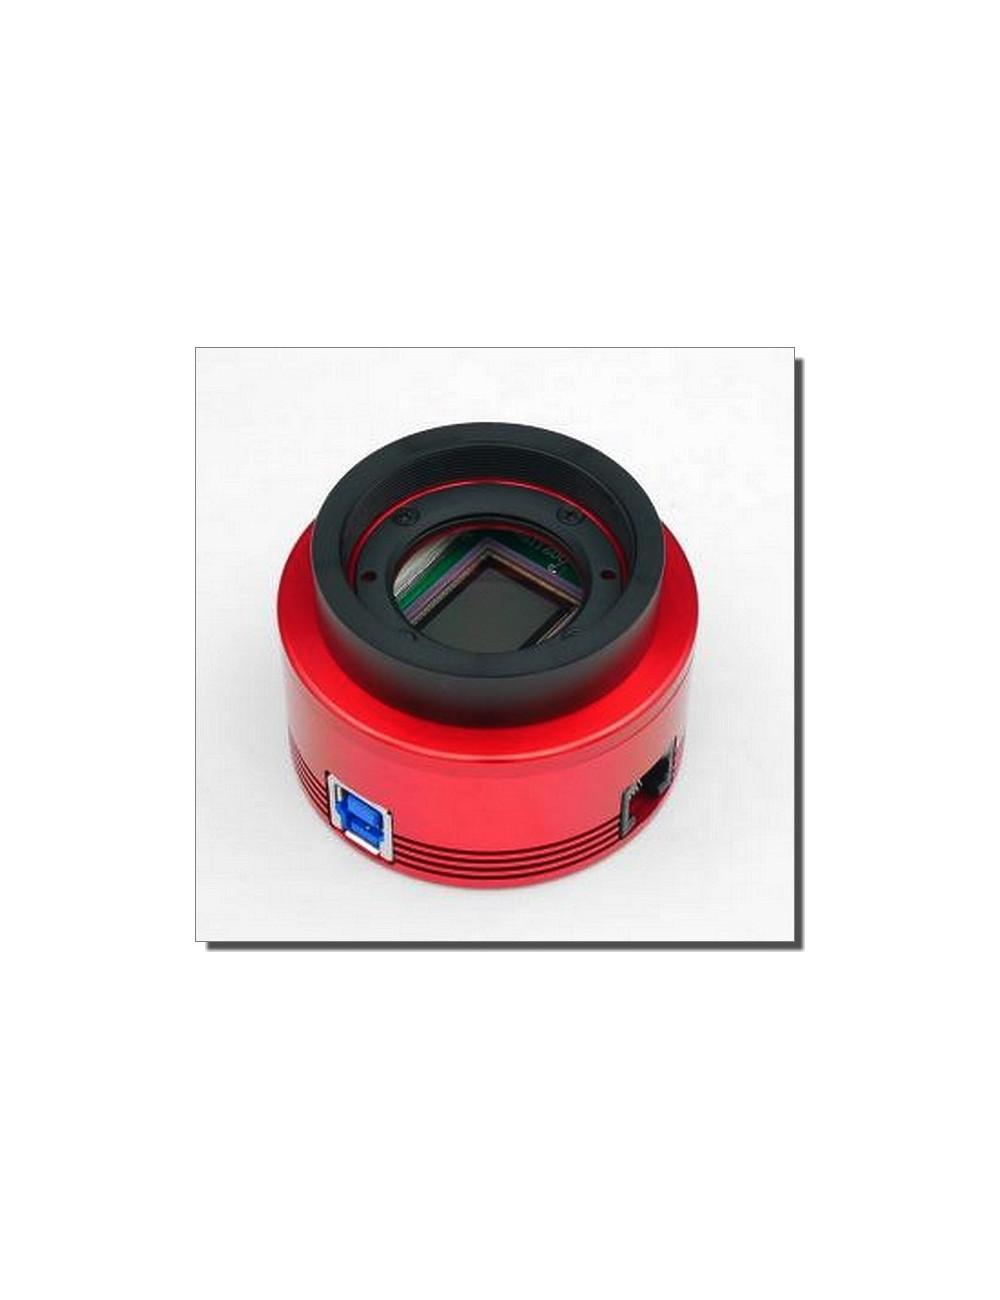 Camera ZWO ASI 1600 MM